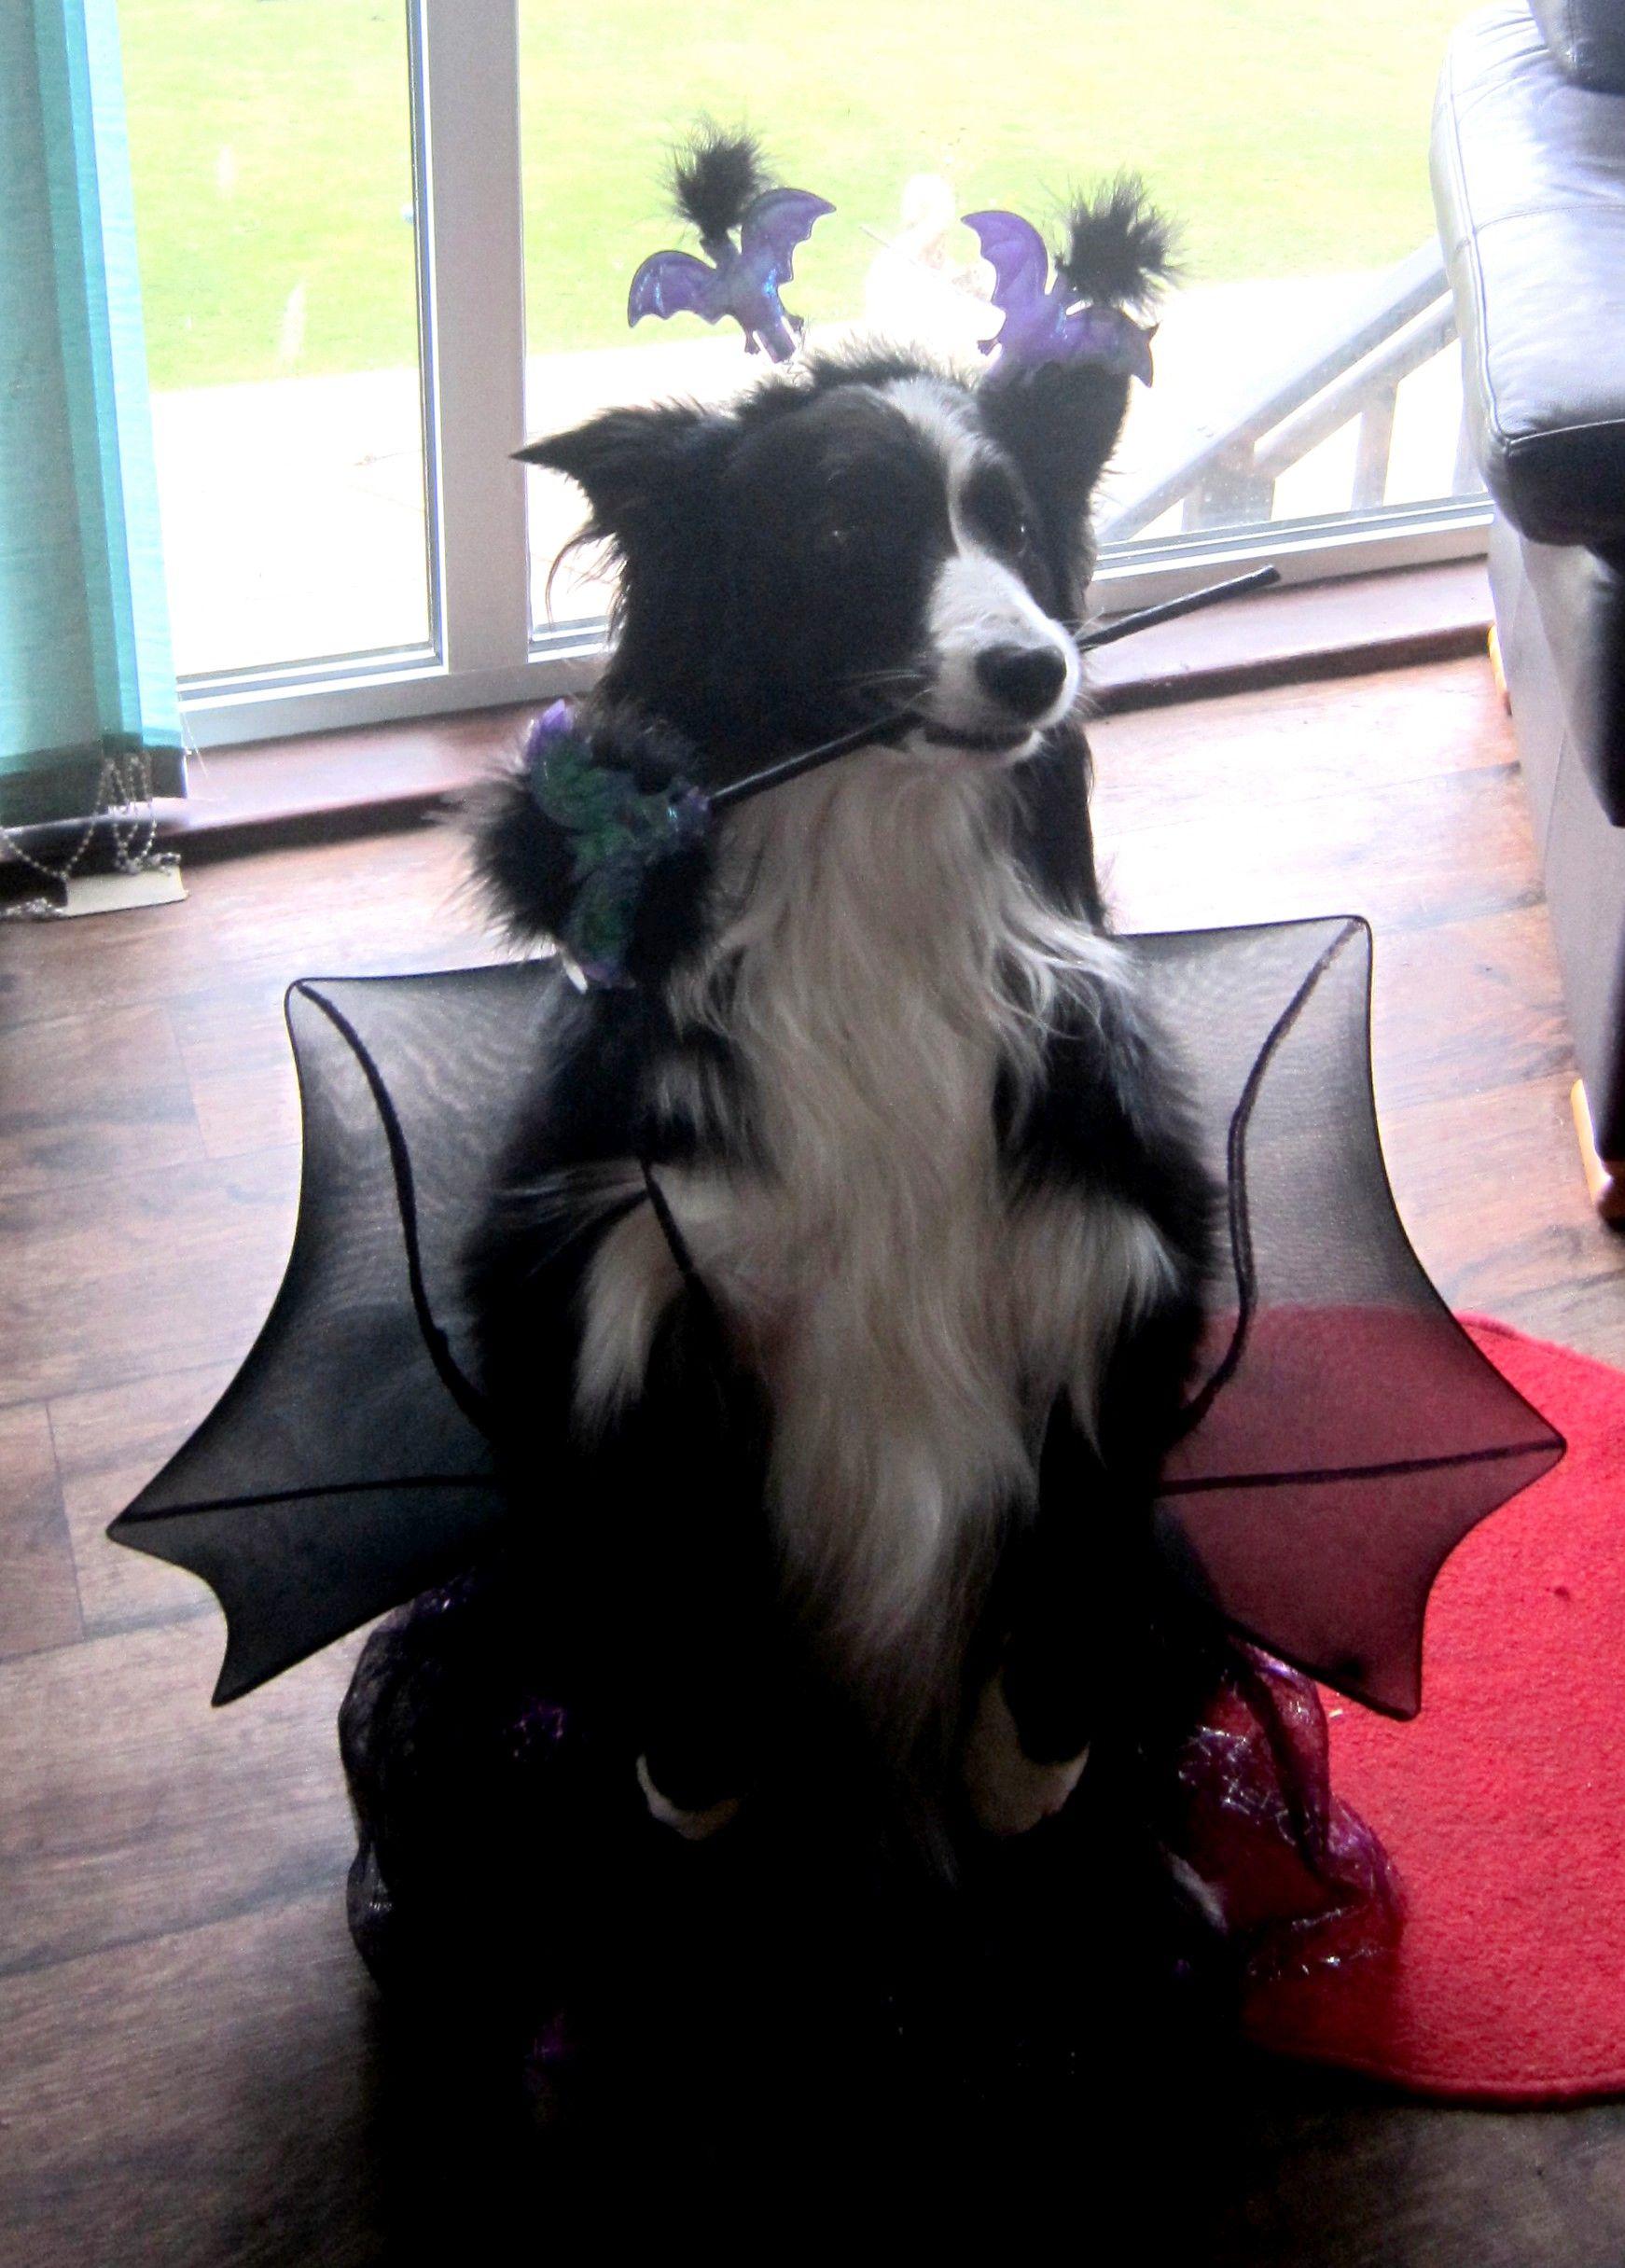 Bat Border Collie in Halloween Costume#Asha the border